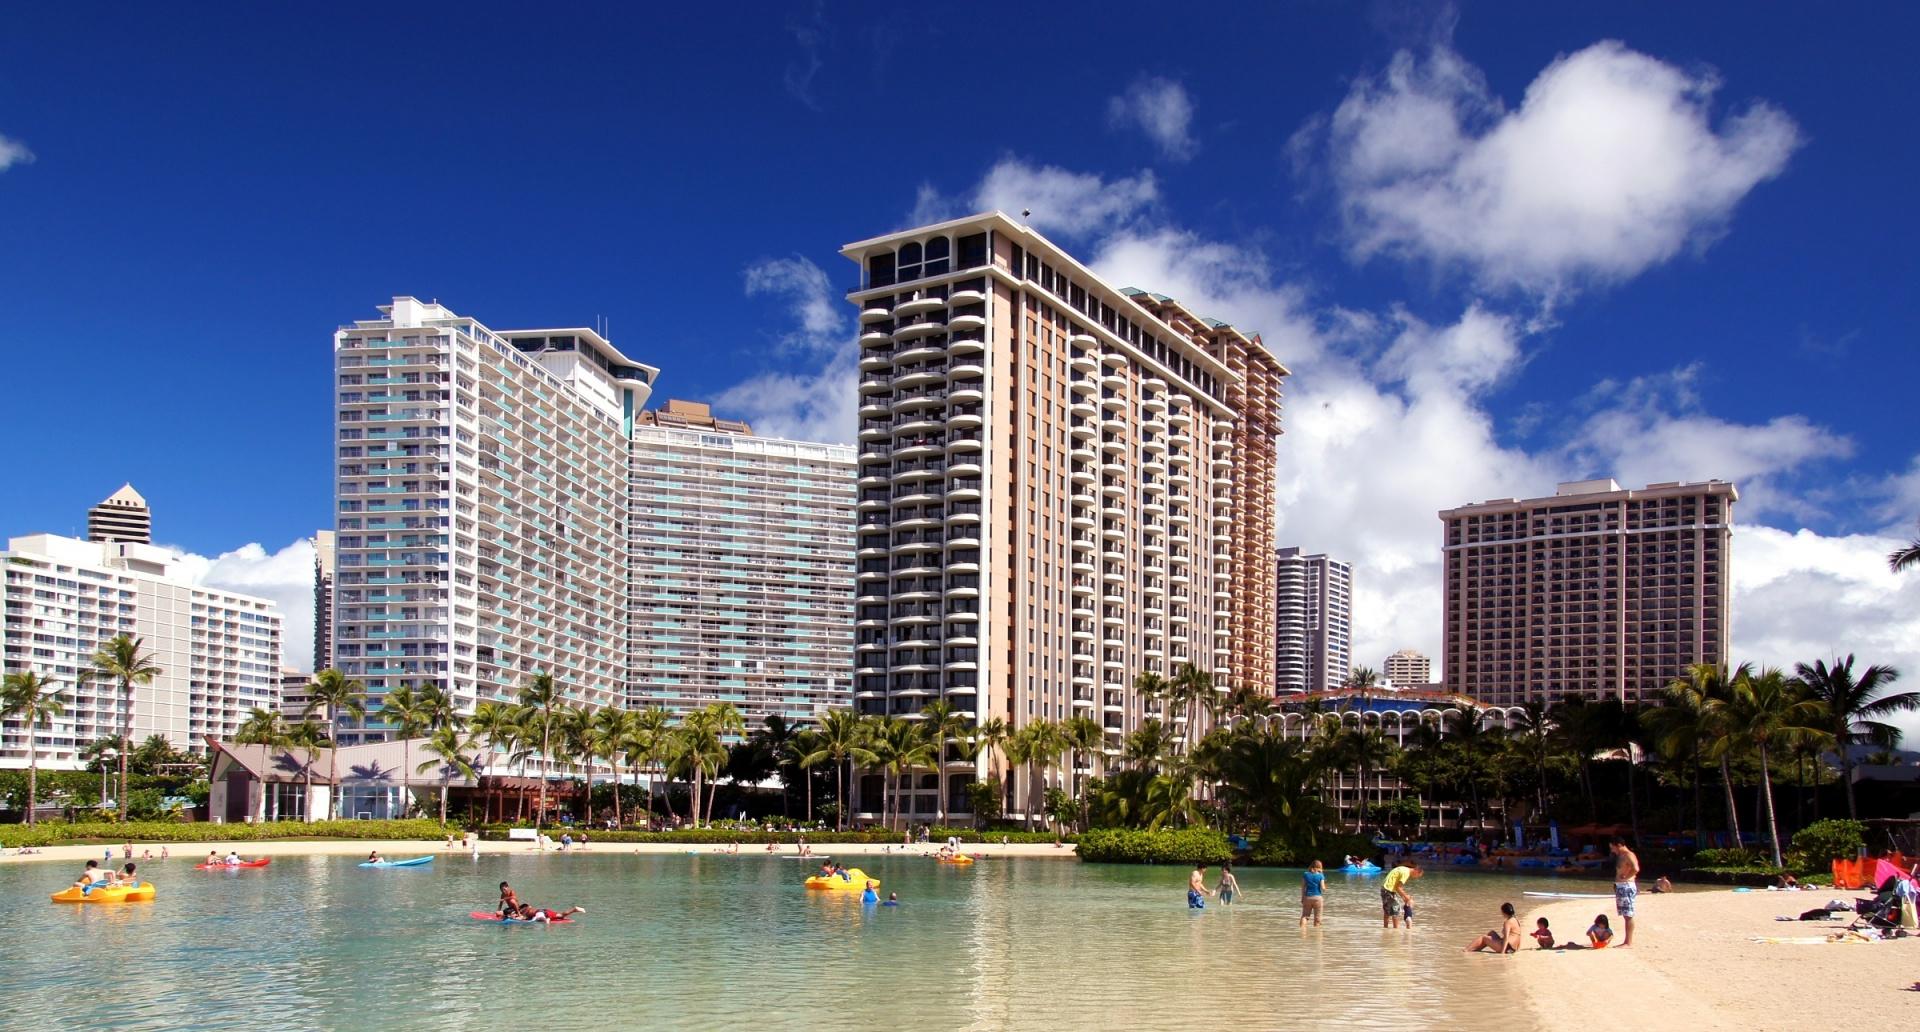 Hotels Waikiki Beach Hawaii Oahu Free Image From Needpix Com